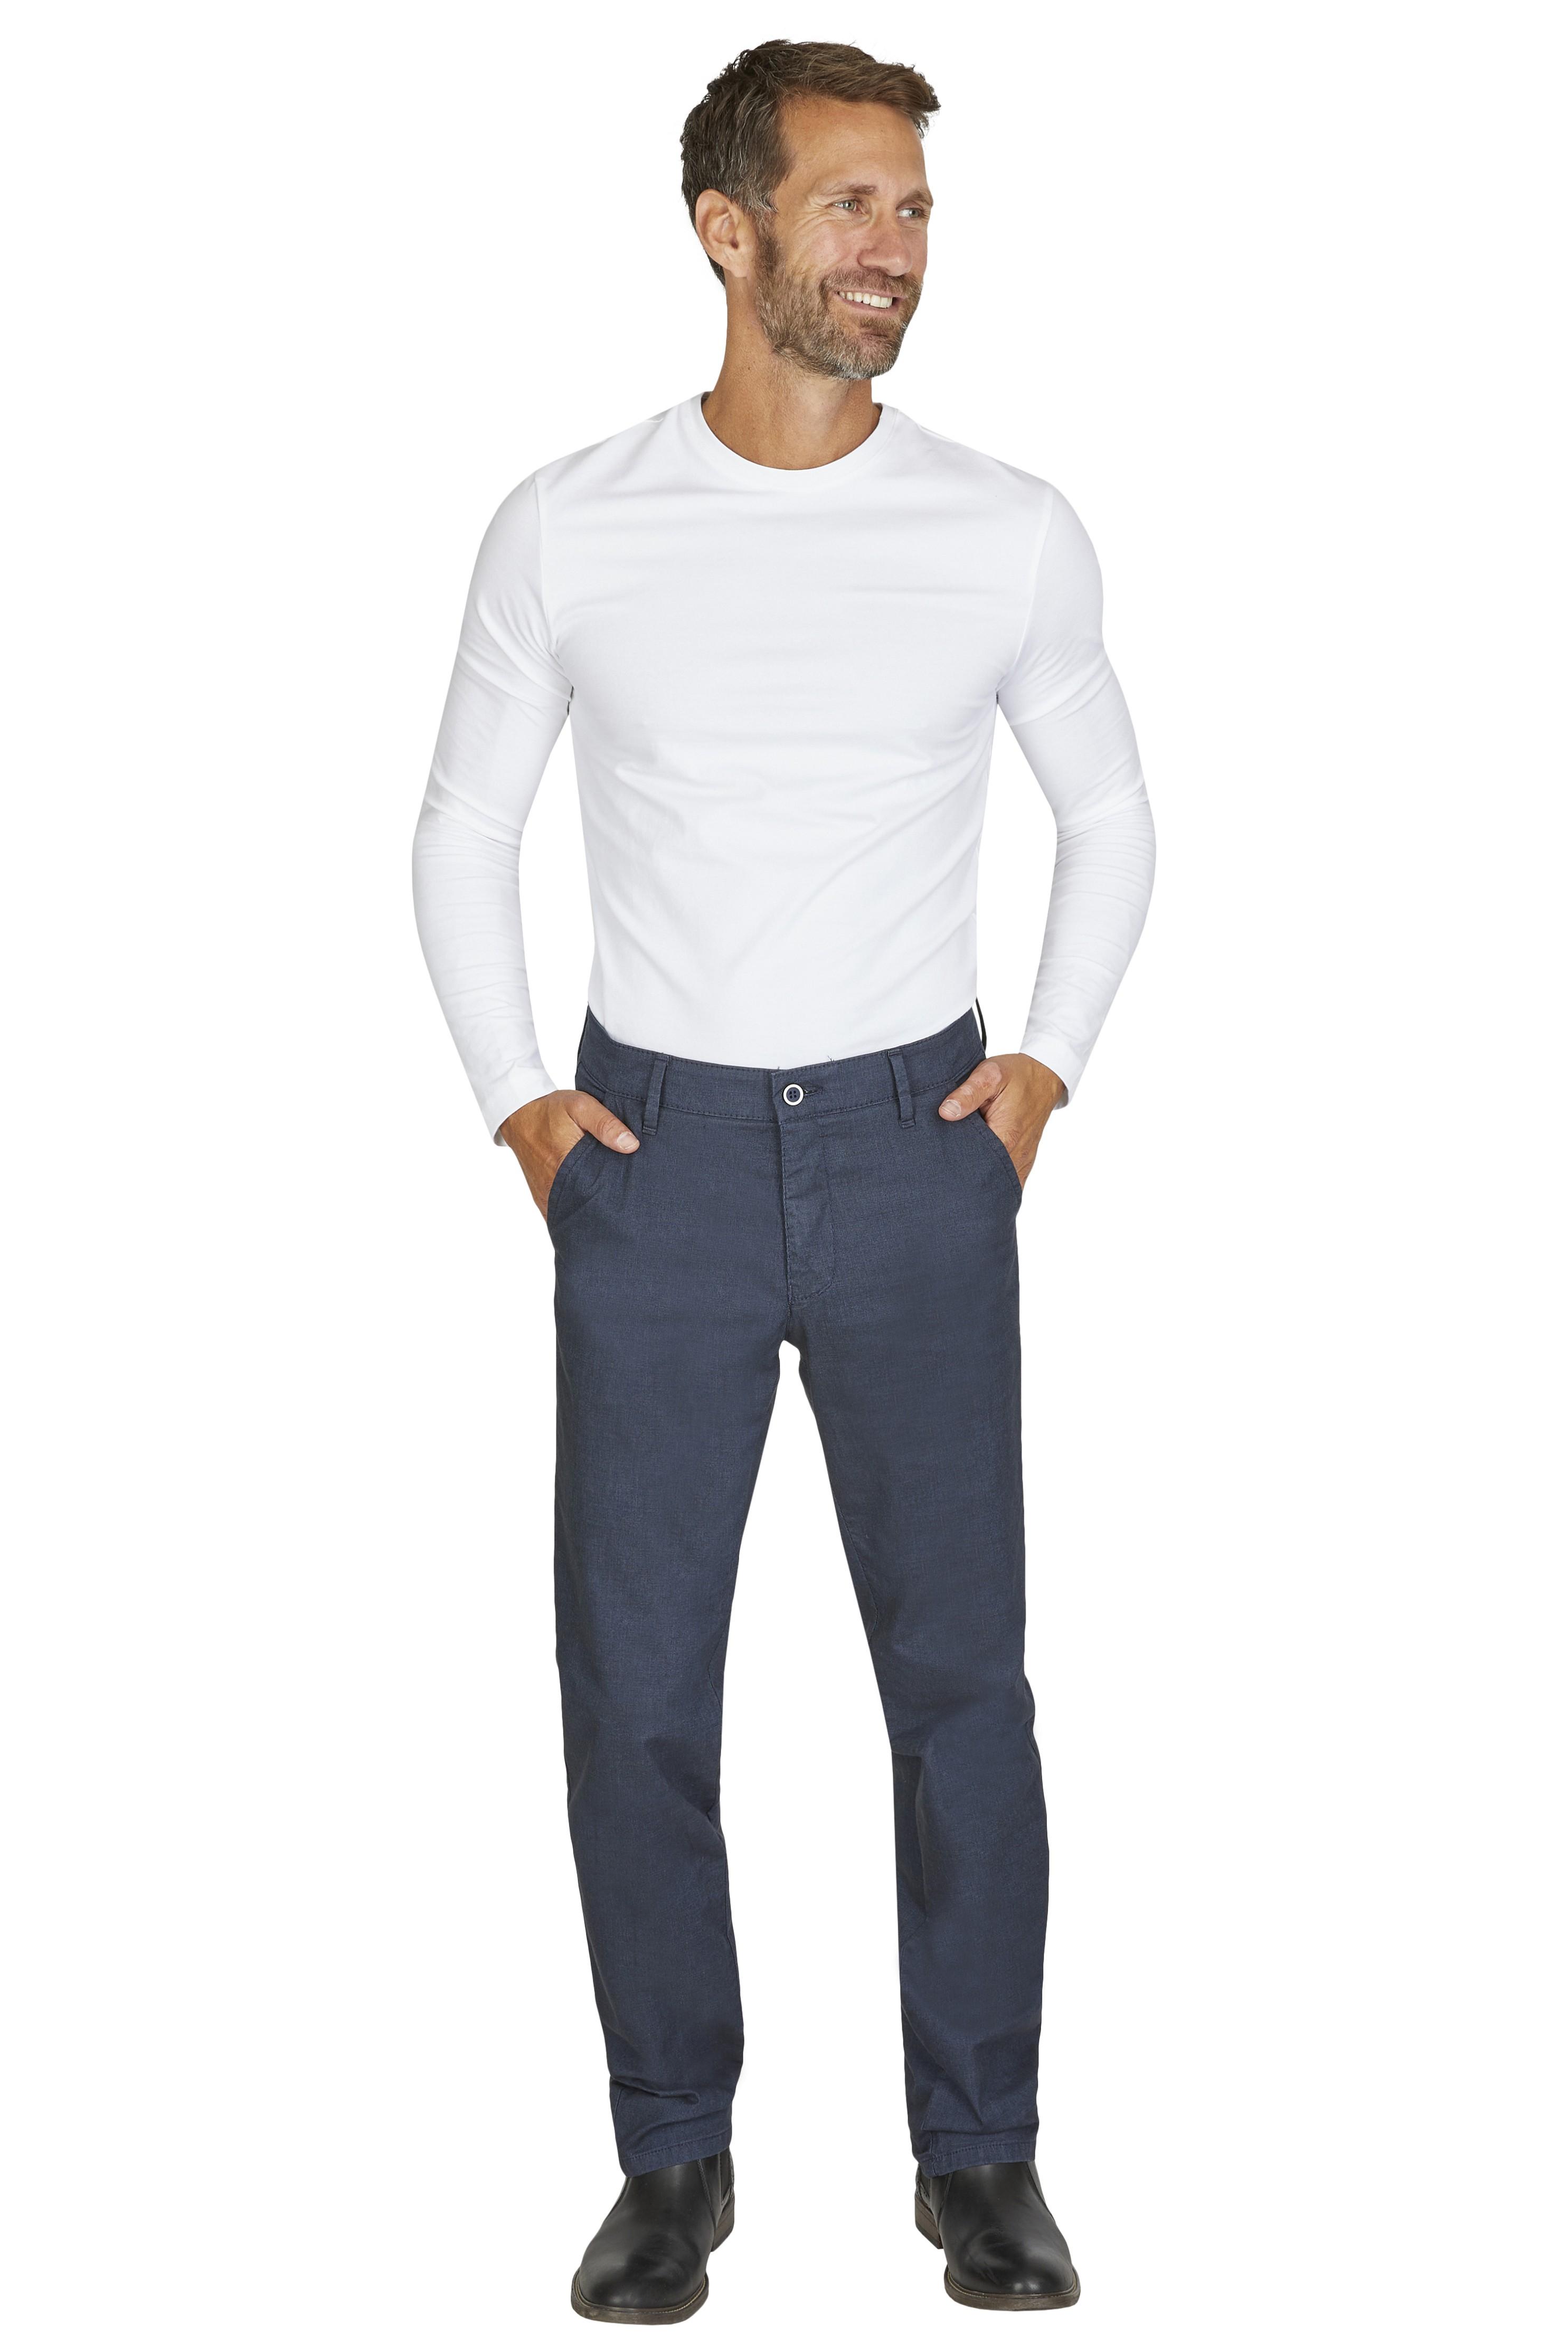 club of comfort -  Stoffhose GARVEY 6910, mit elastischem Komfortbund